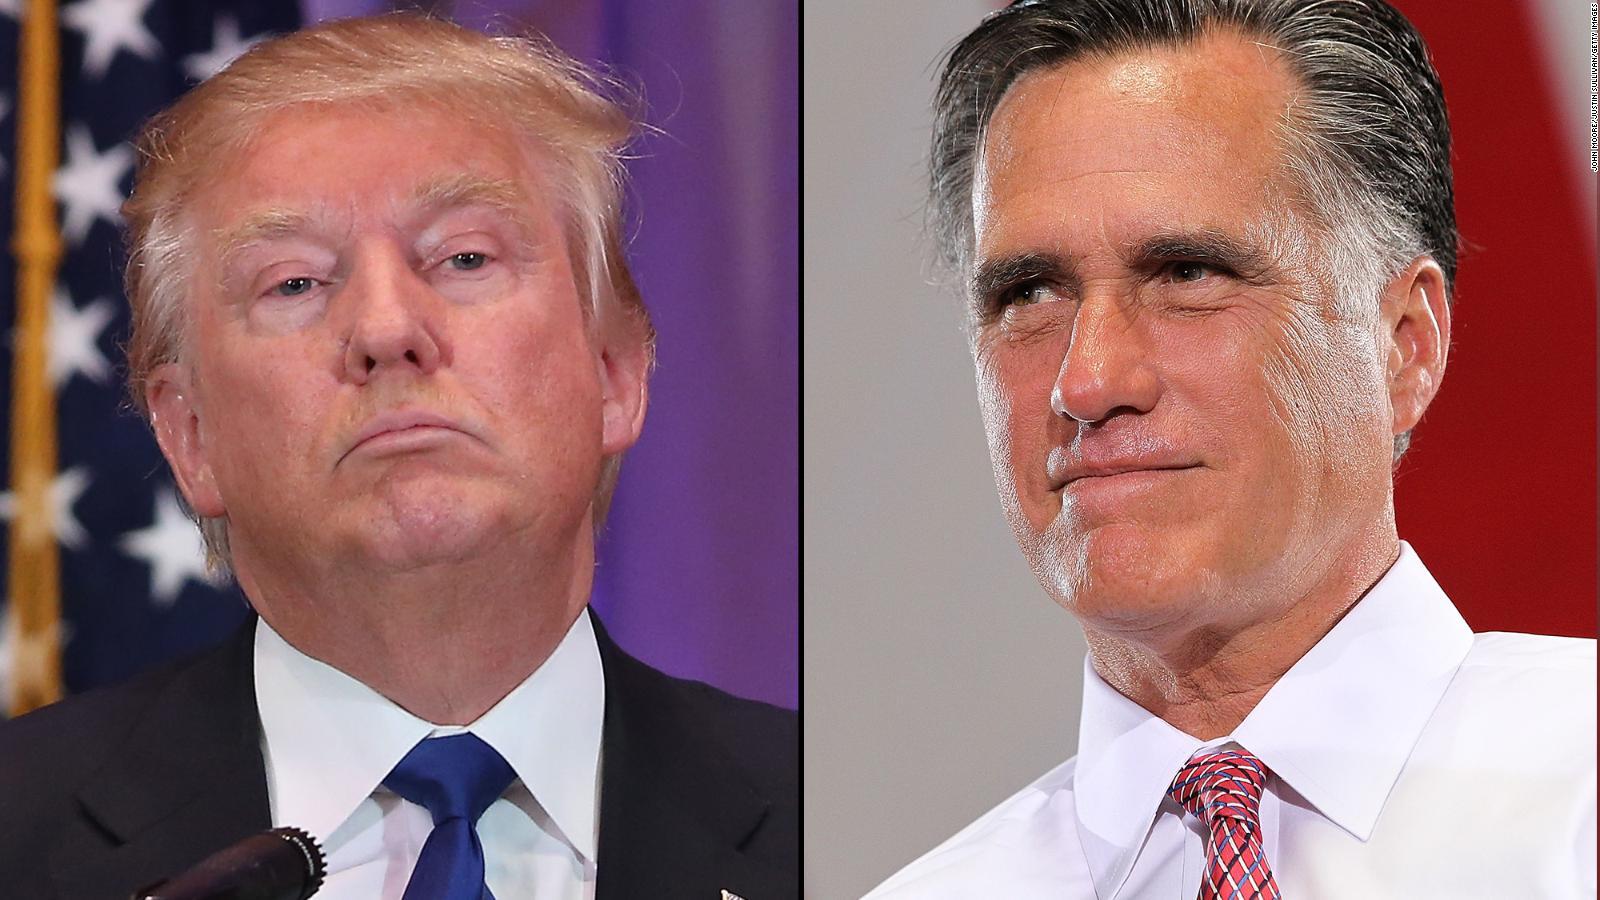 donald trump mitt romney meeting another wild twist donald trump mitt romney meeting another wild 2016 twist cnnpolitics com